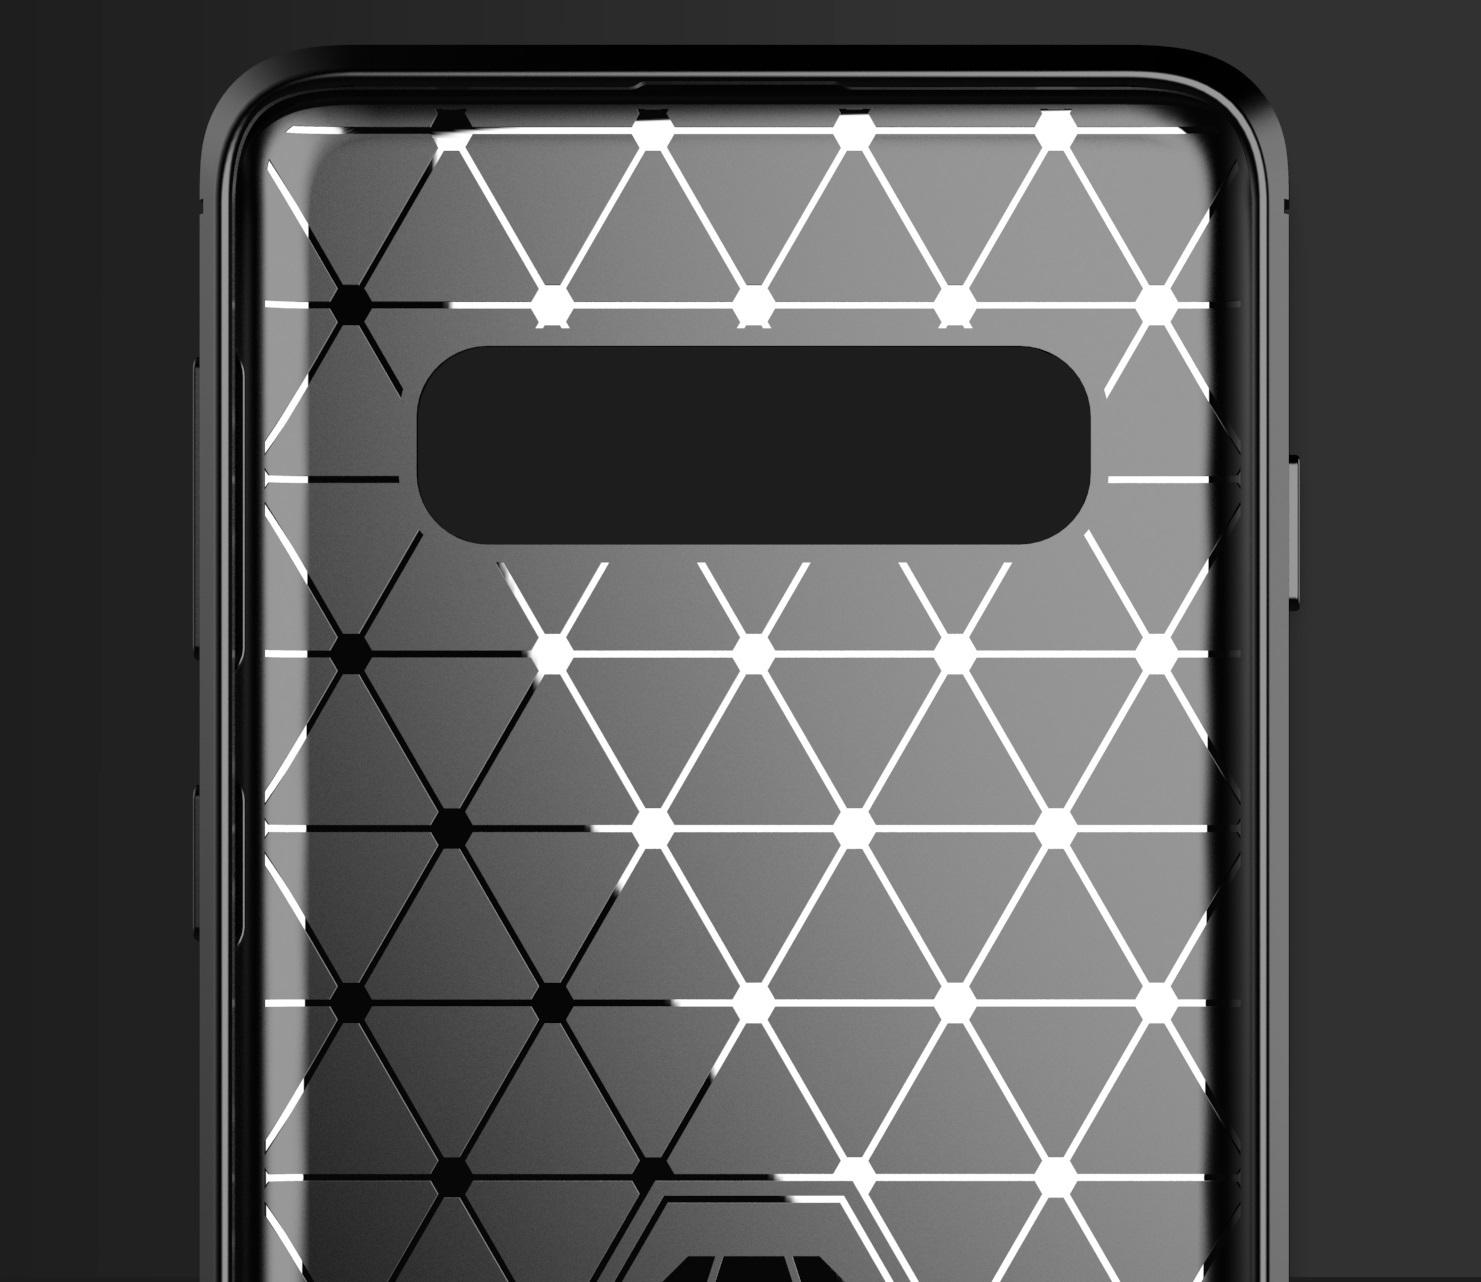 Чехол Samsung Galaxy S10 Plus цвет Gray (серый), серия Carbon, Caseport